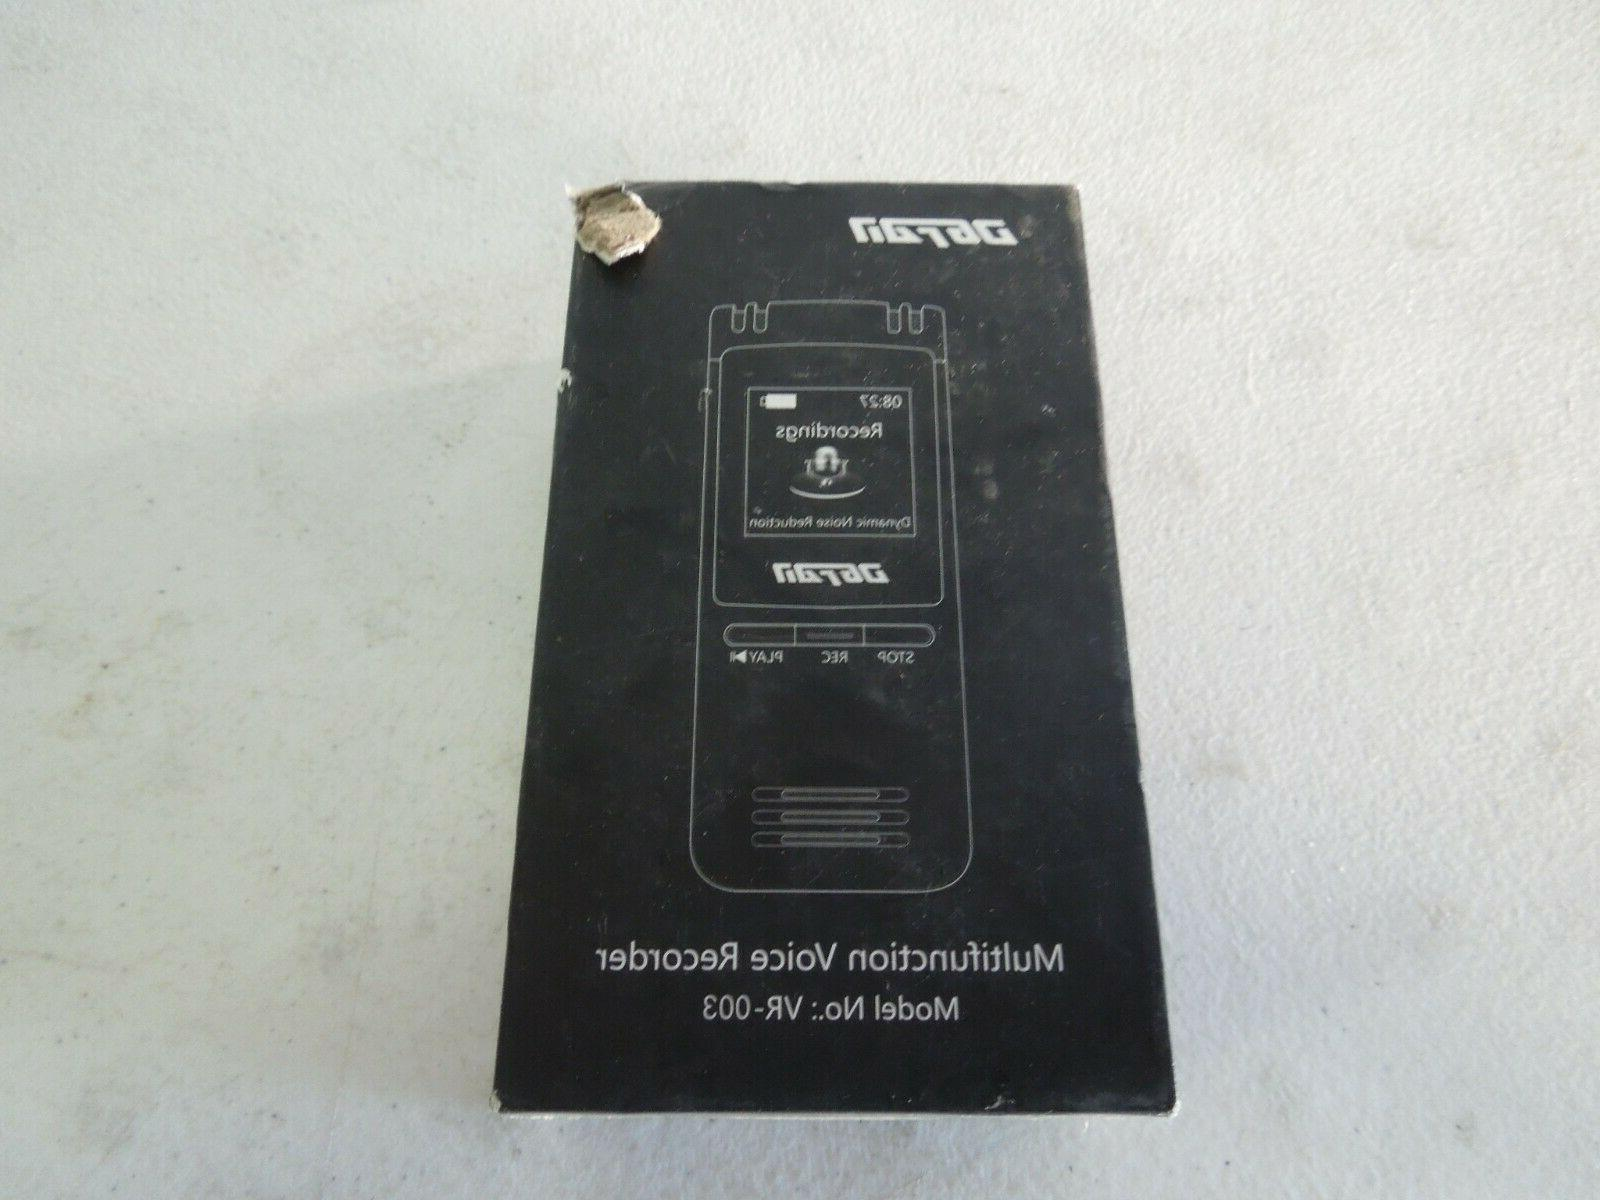 voice recorder vr 003 8gb multifunction voice